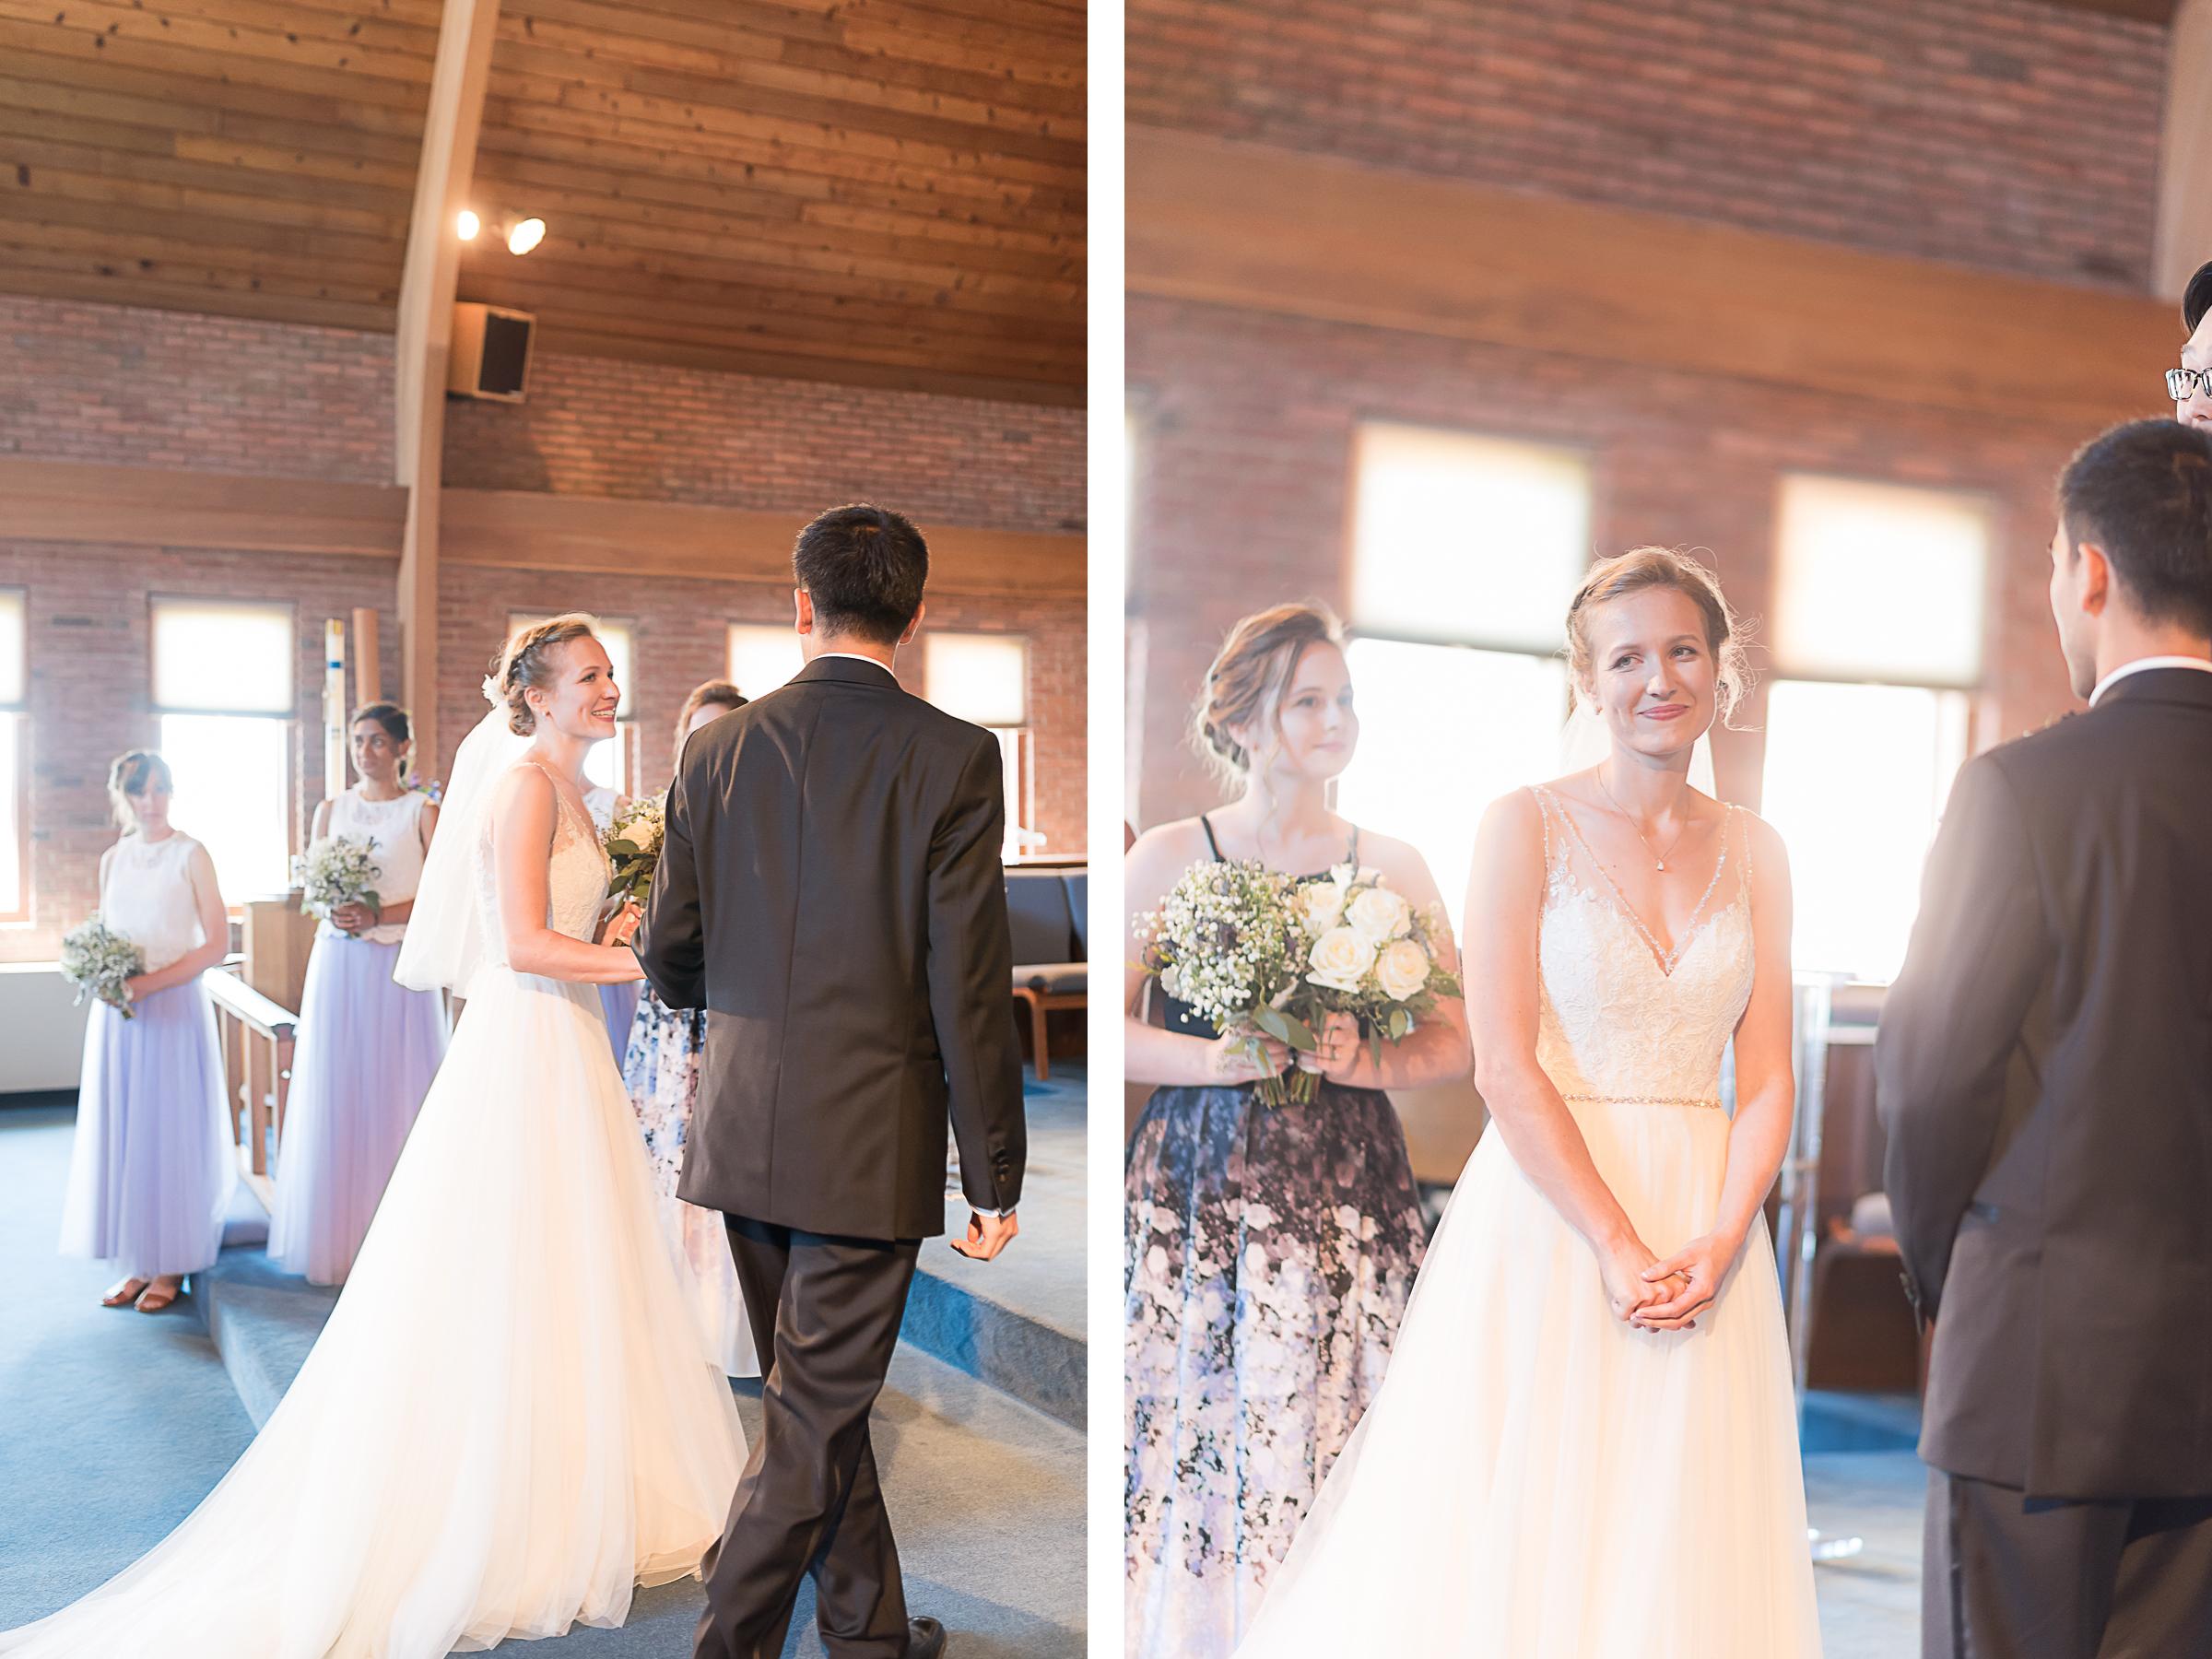 Elkridge-Furnace-Inn-Wedding-Ceremony-Bride-Groom